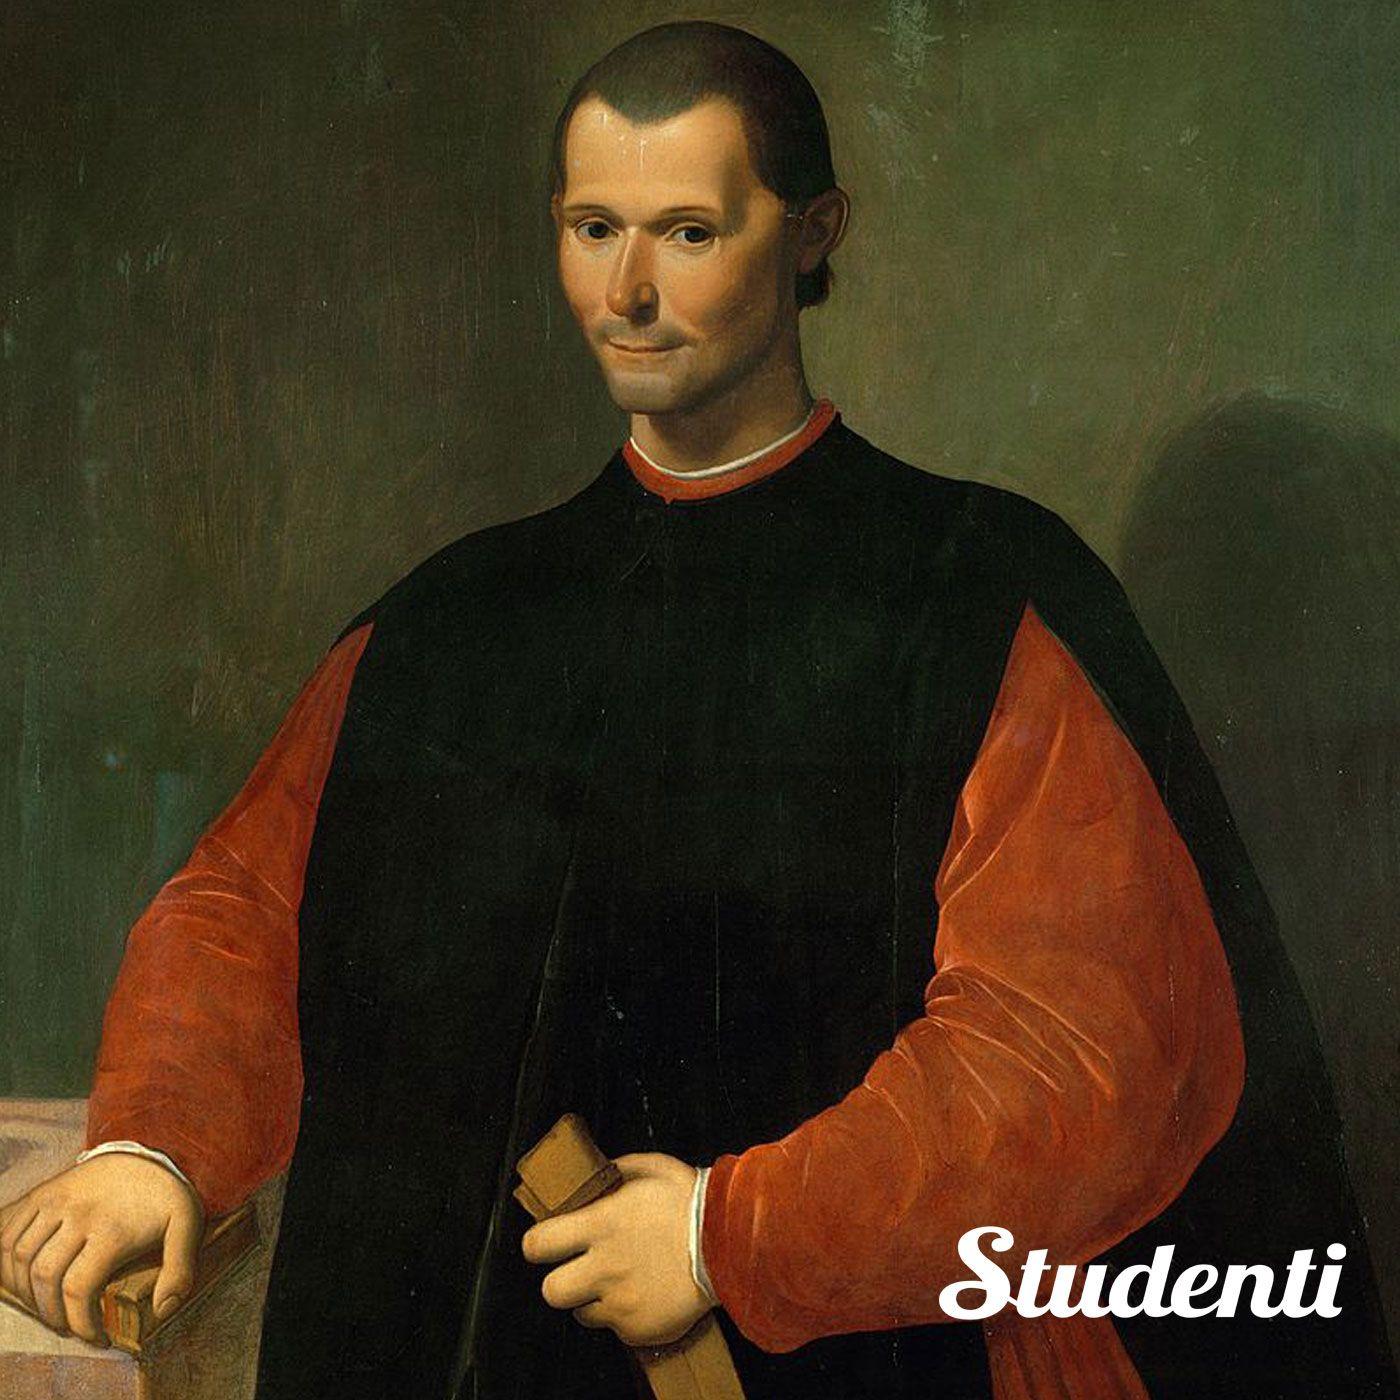 Biografie - Niccolò Machiavelli